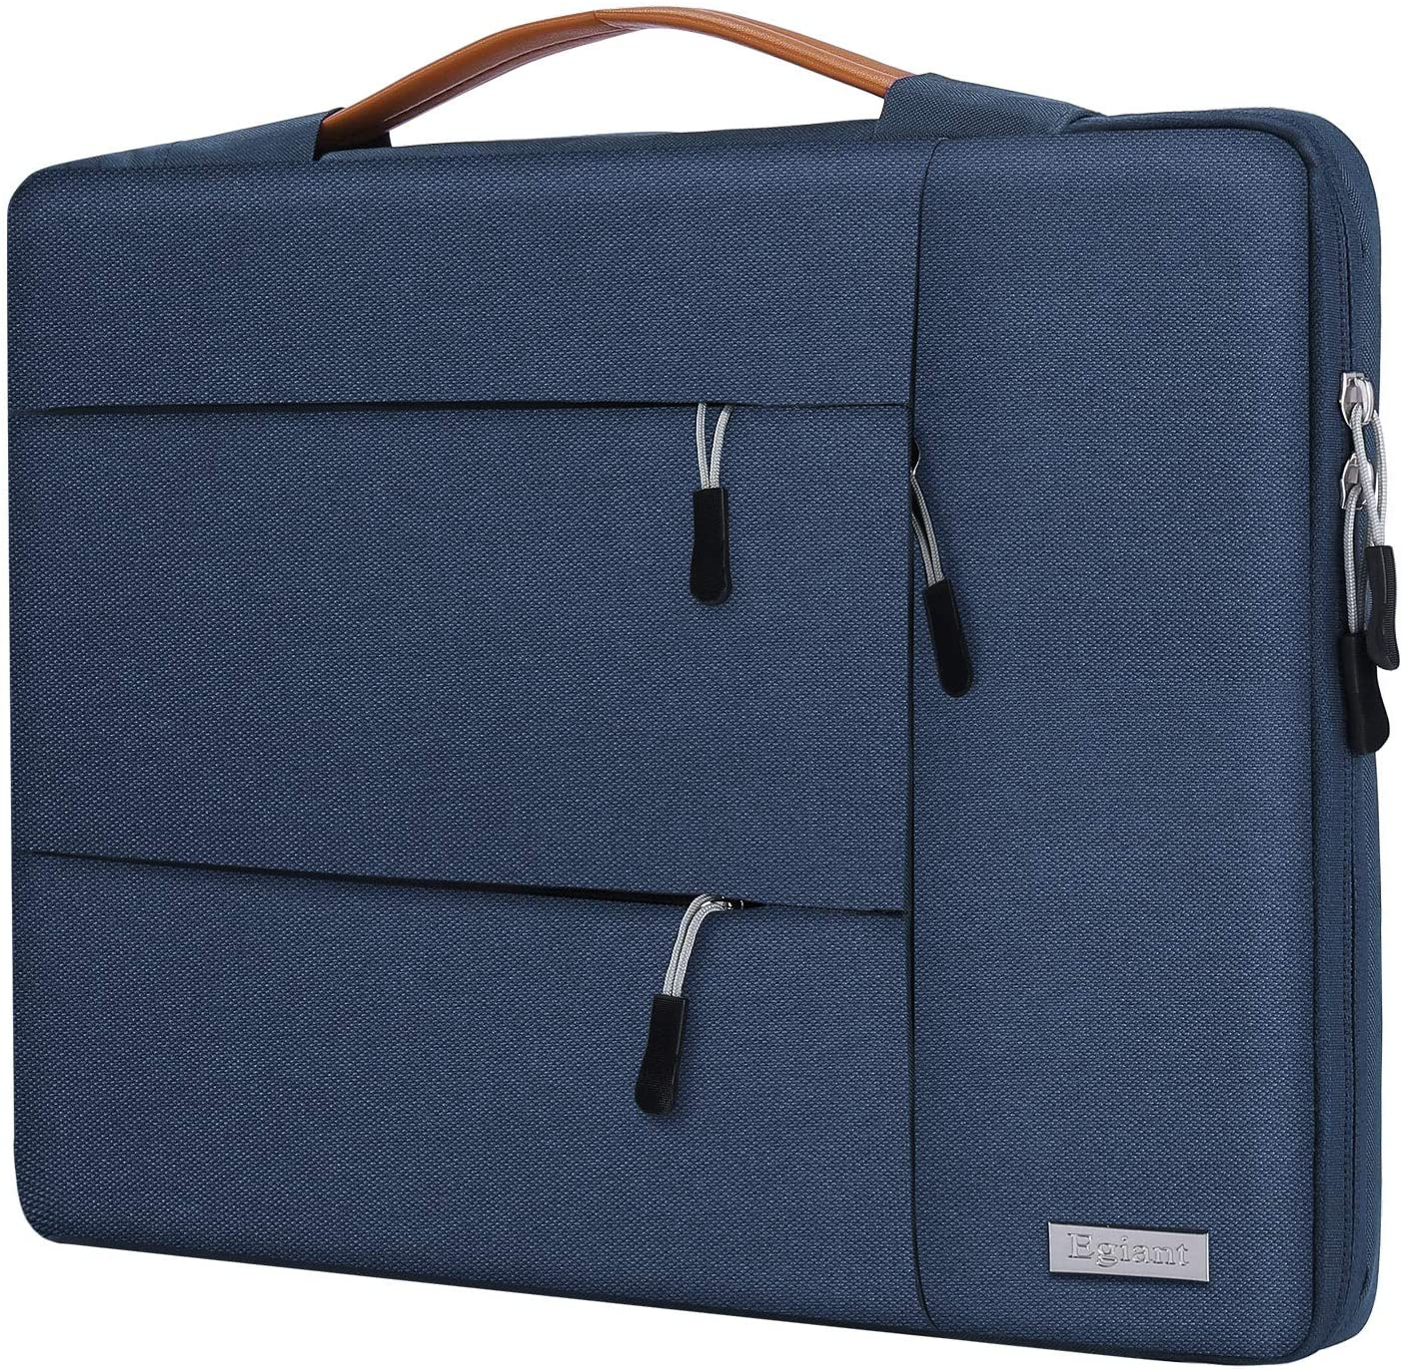 Egiant 14 inch Laptop Sleeve Case,360°Protective Handbag for HP Chromebook 14,Acer Spin 3/Aspire 1,Dell Inspiron 14/Latitude, Flex 14,ASUS VivoBook Zenbook,Water-Resistant Notebook Bag, Blue